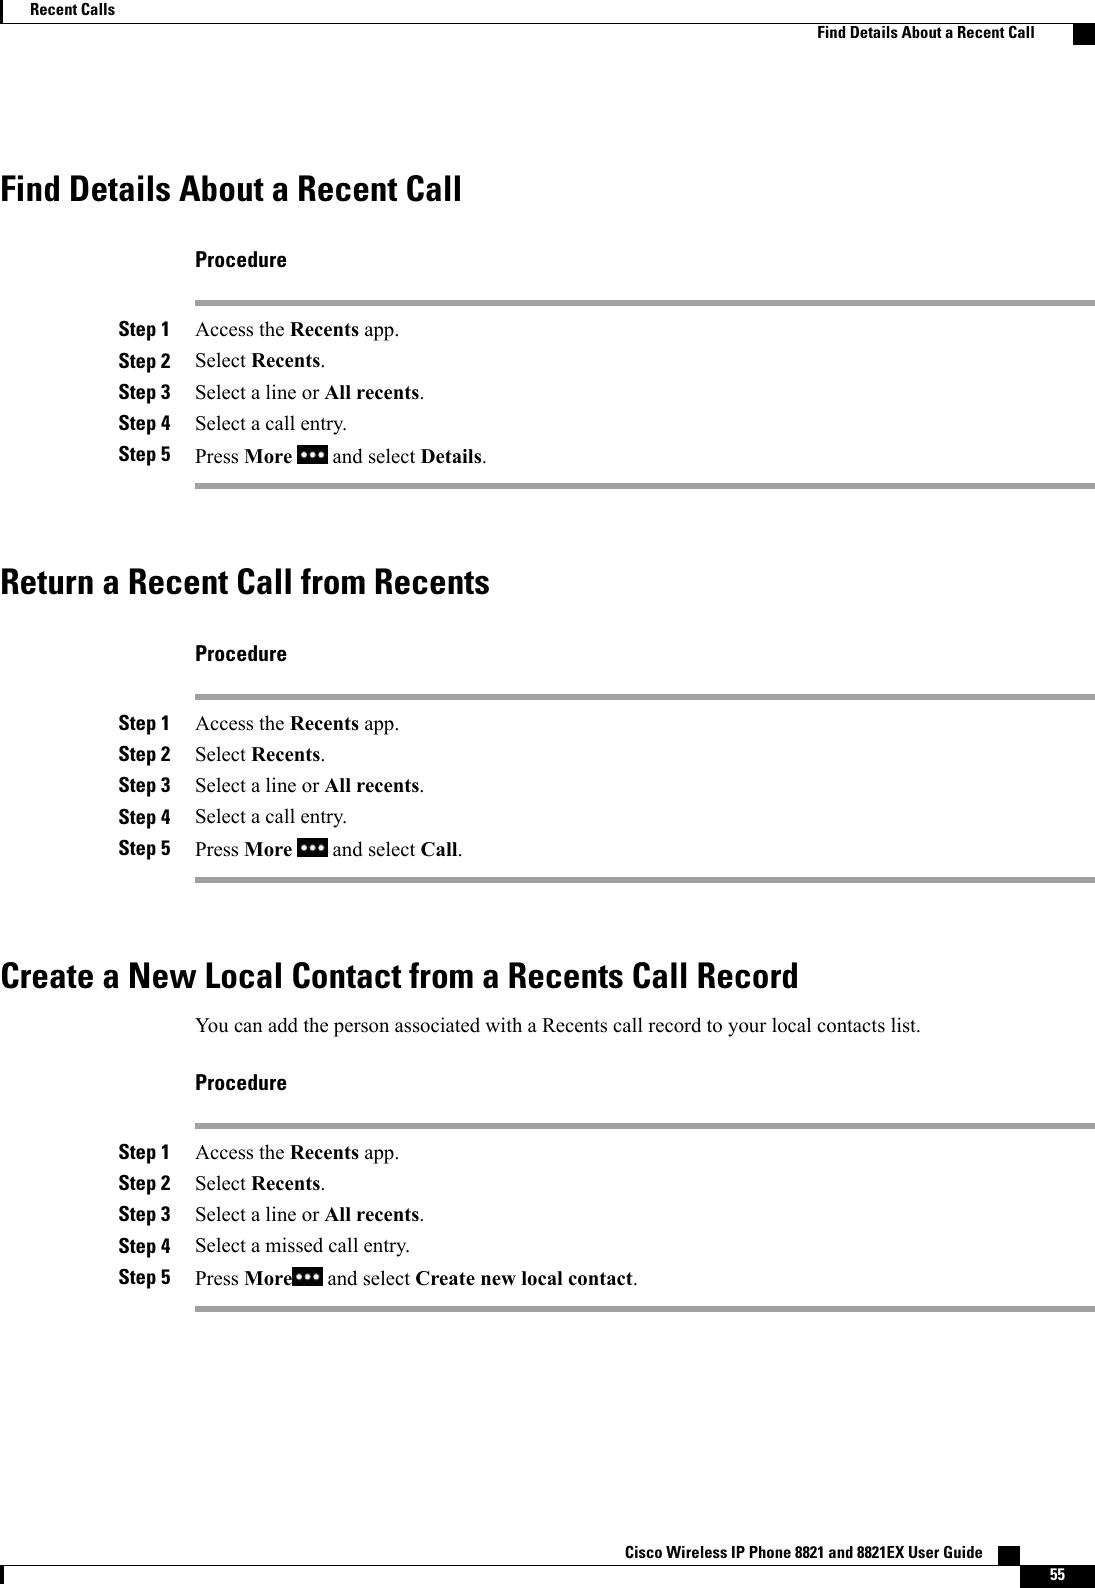 cisco ip phone spa508g user manual